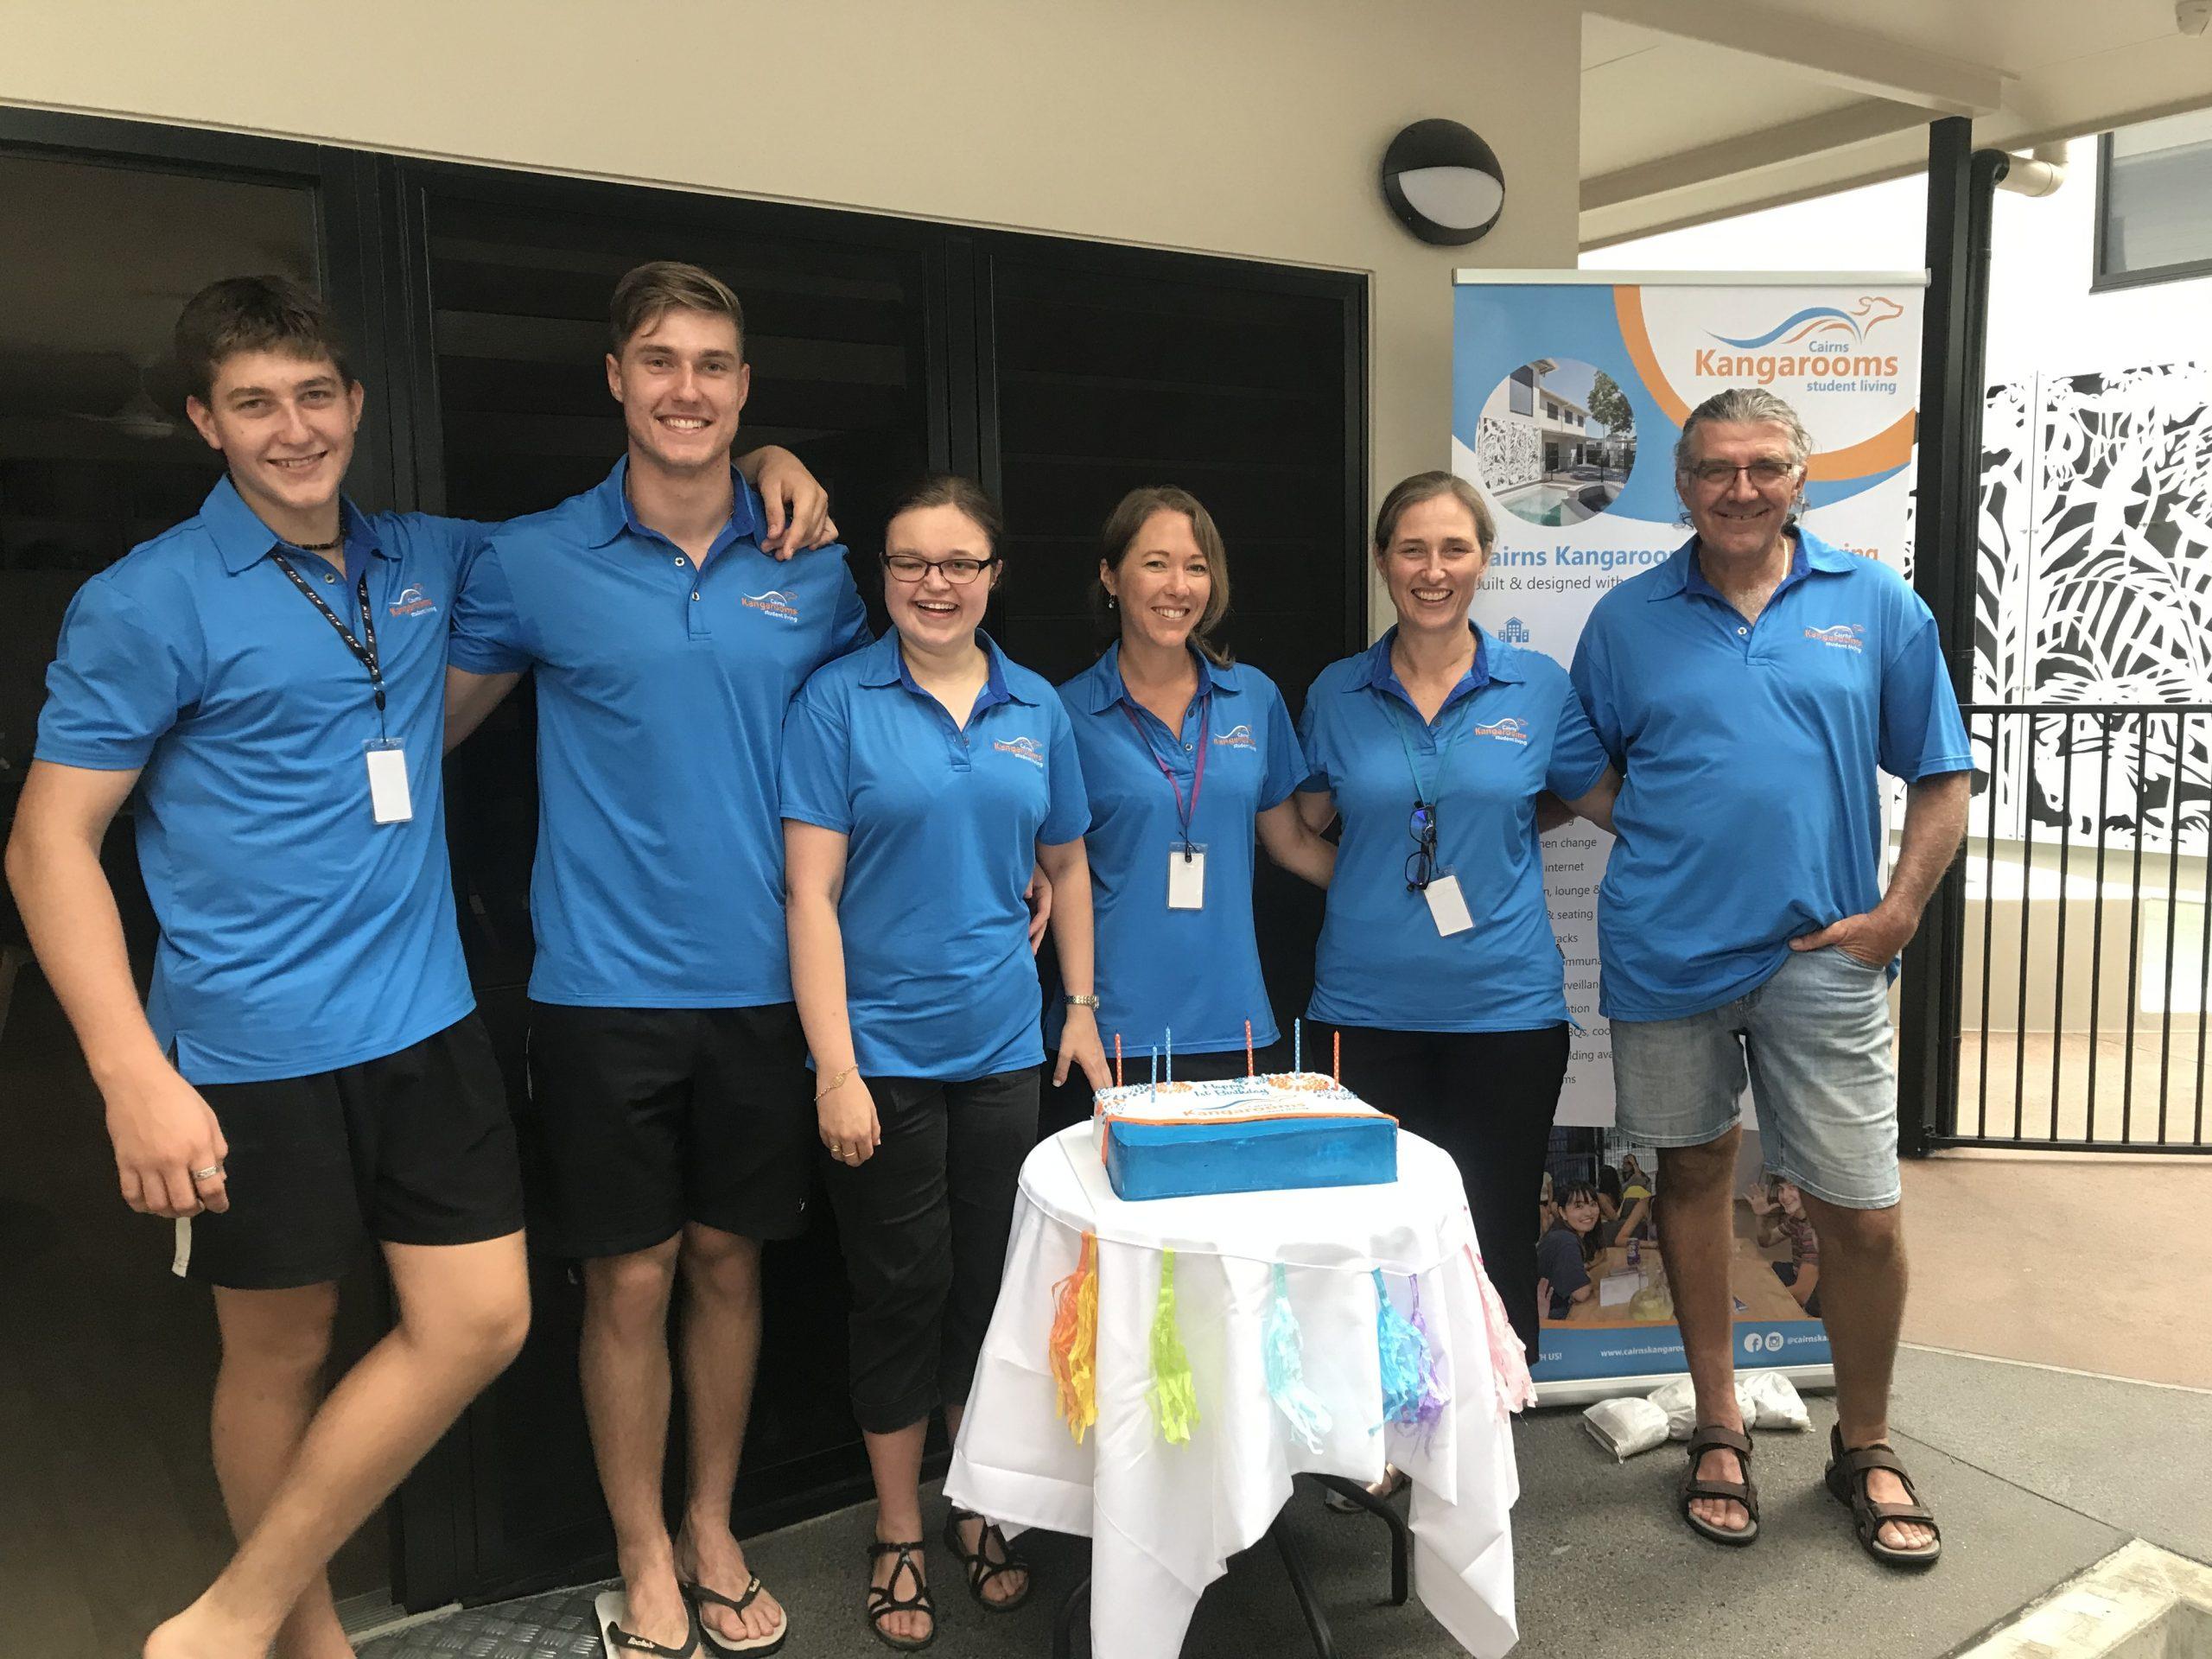 Cairns Kangarooms Team - February 2020